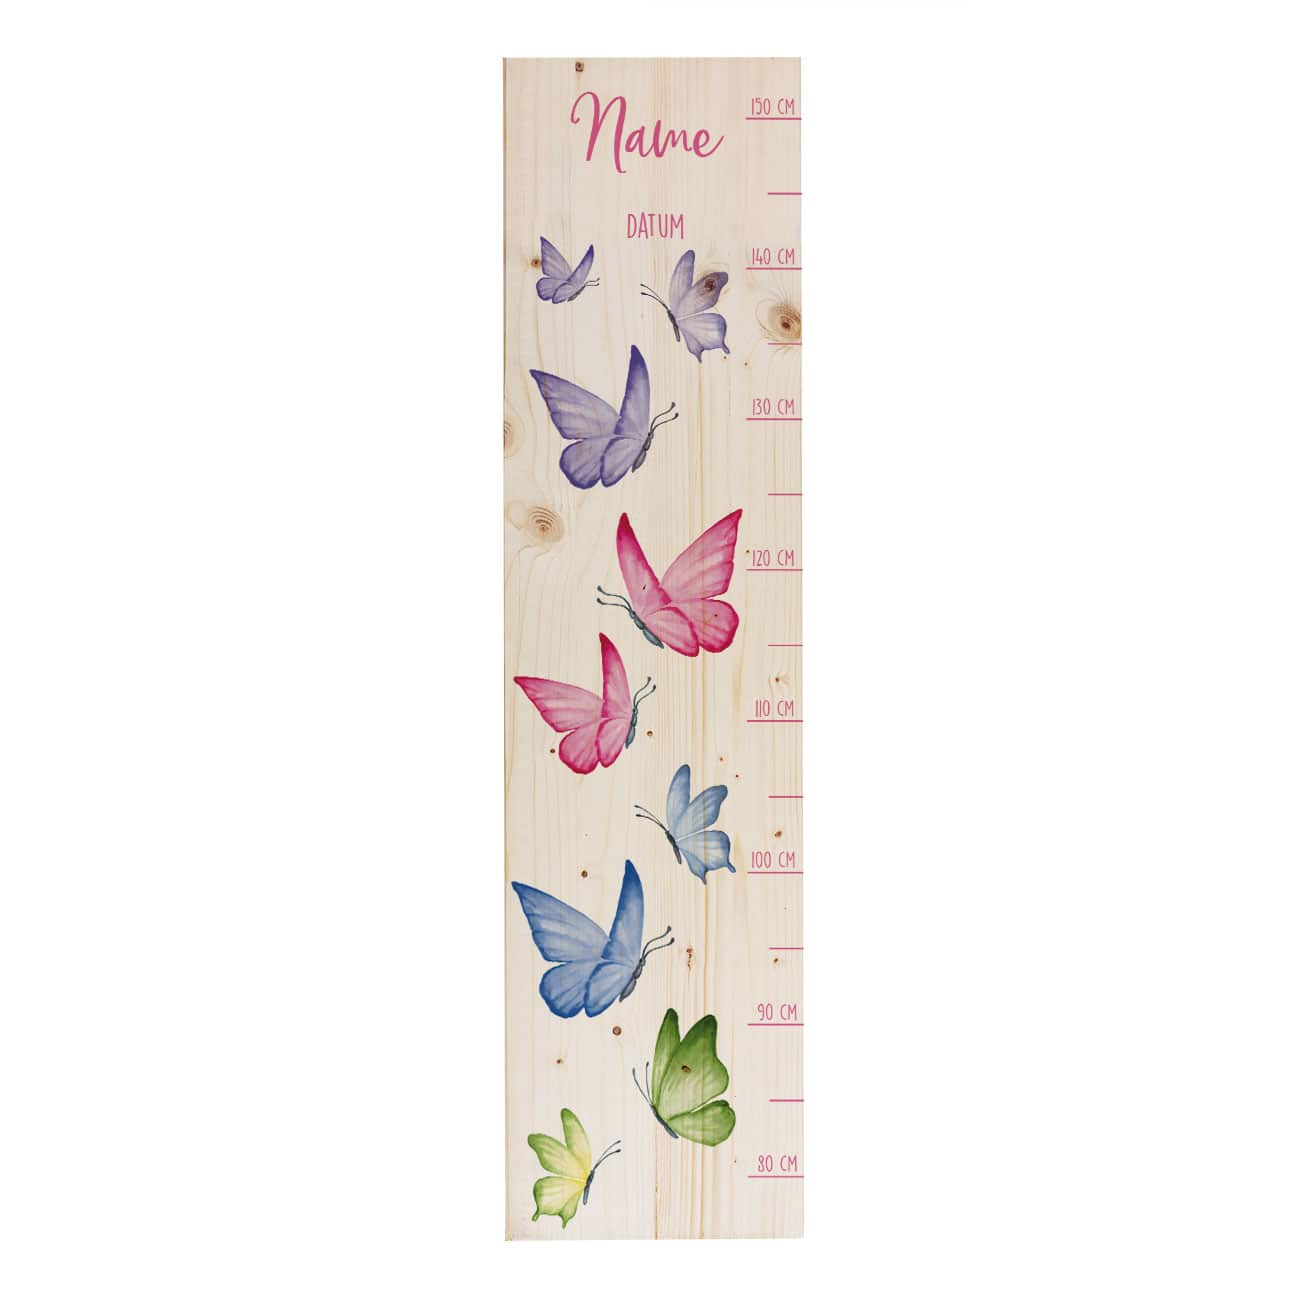 Messlatte für Kinder Schmetterlinge